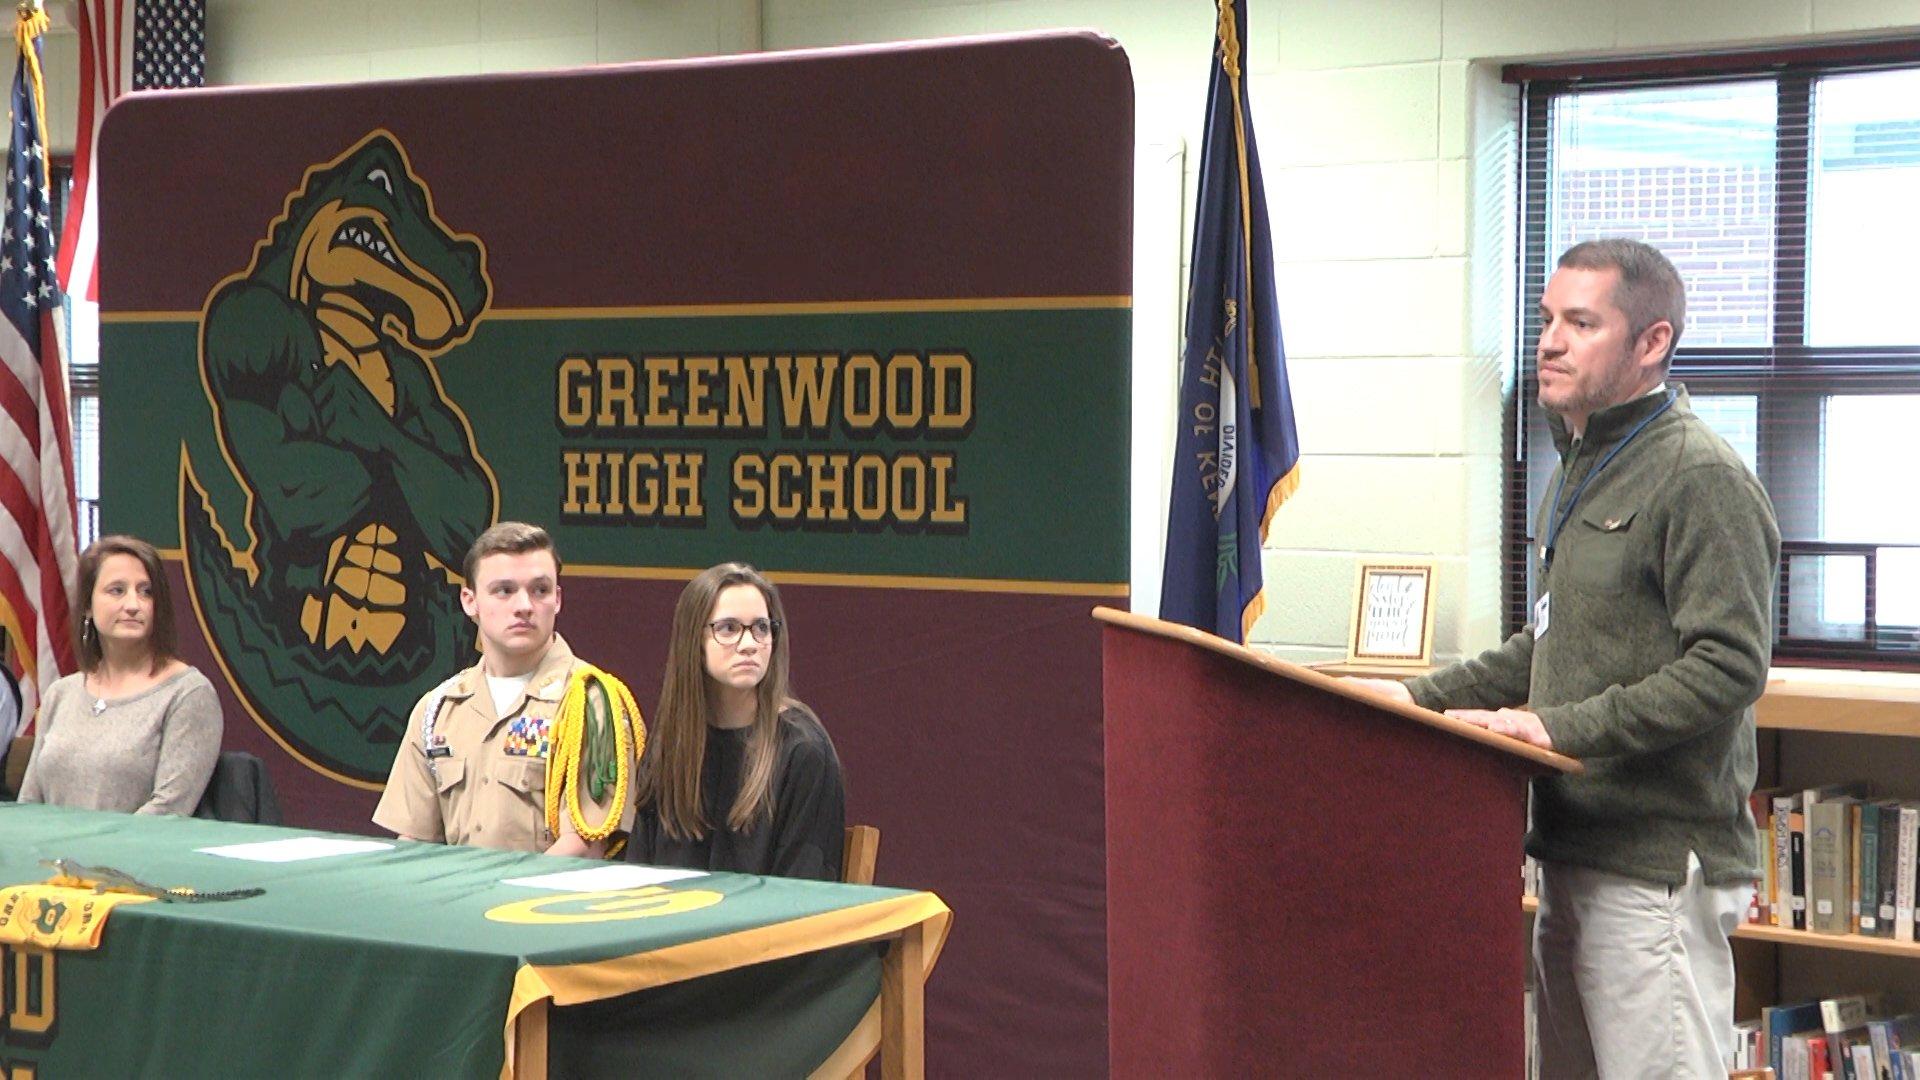 Greenwood High School student earns $75K scholarship - WNKY